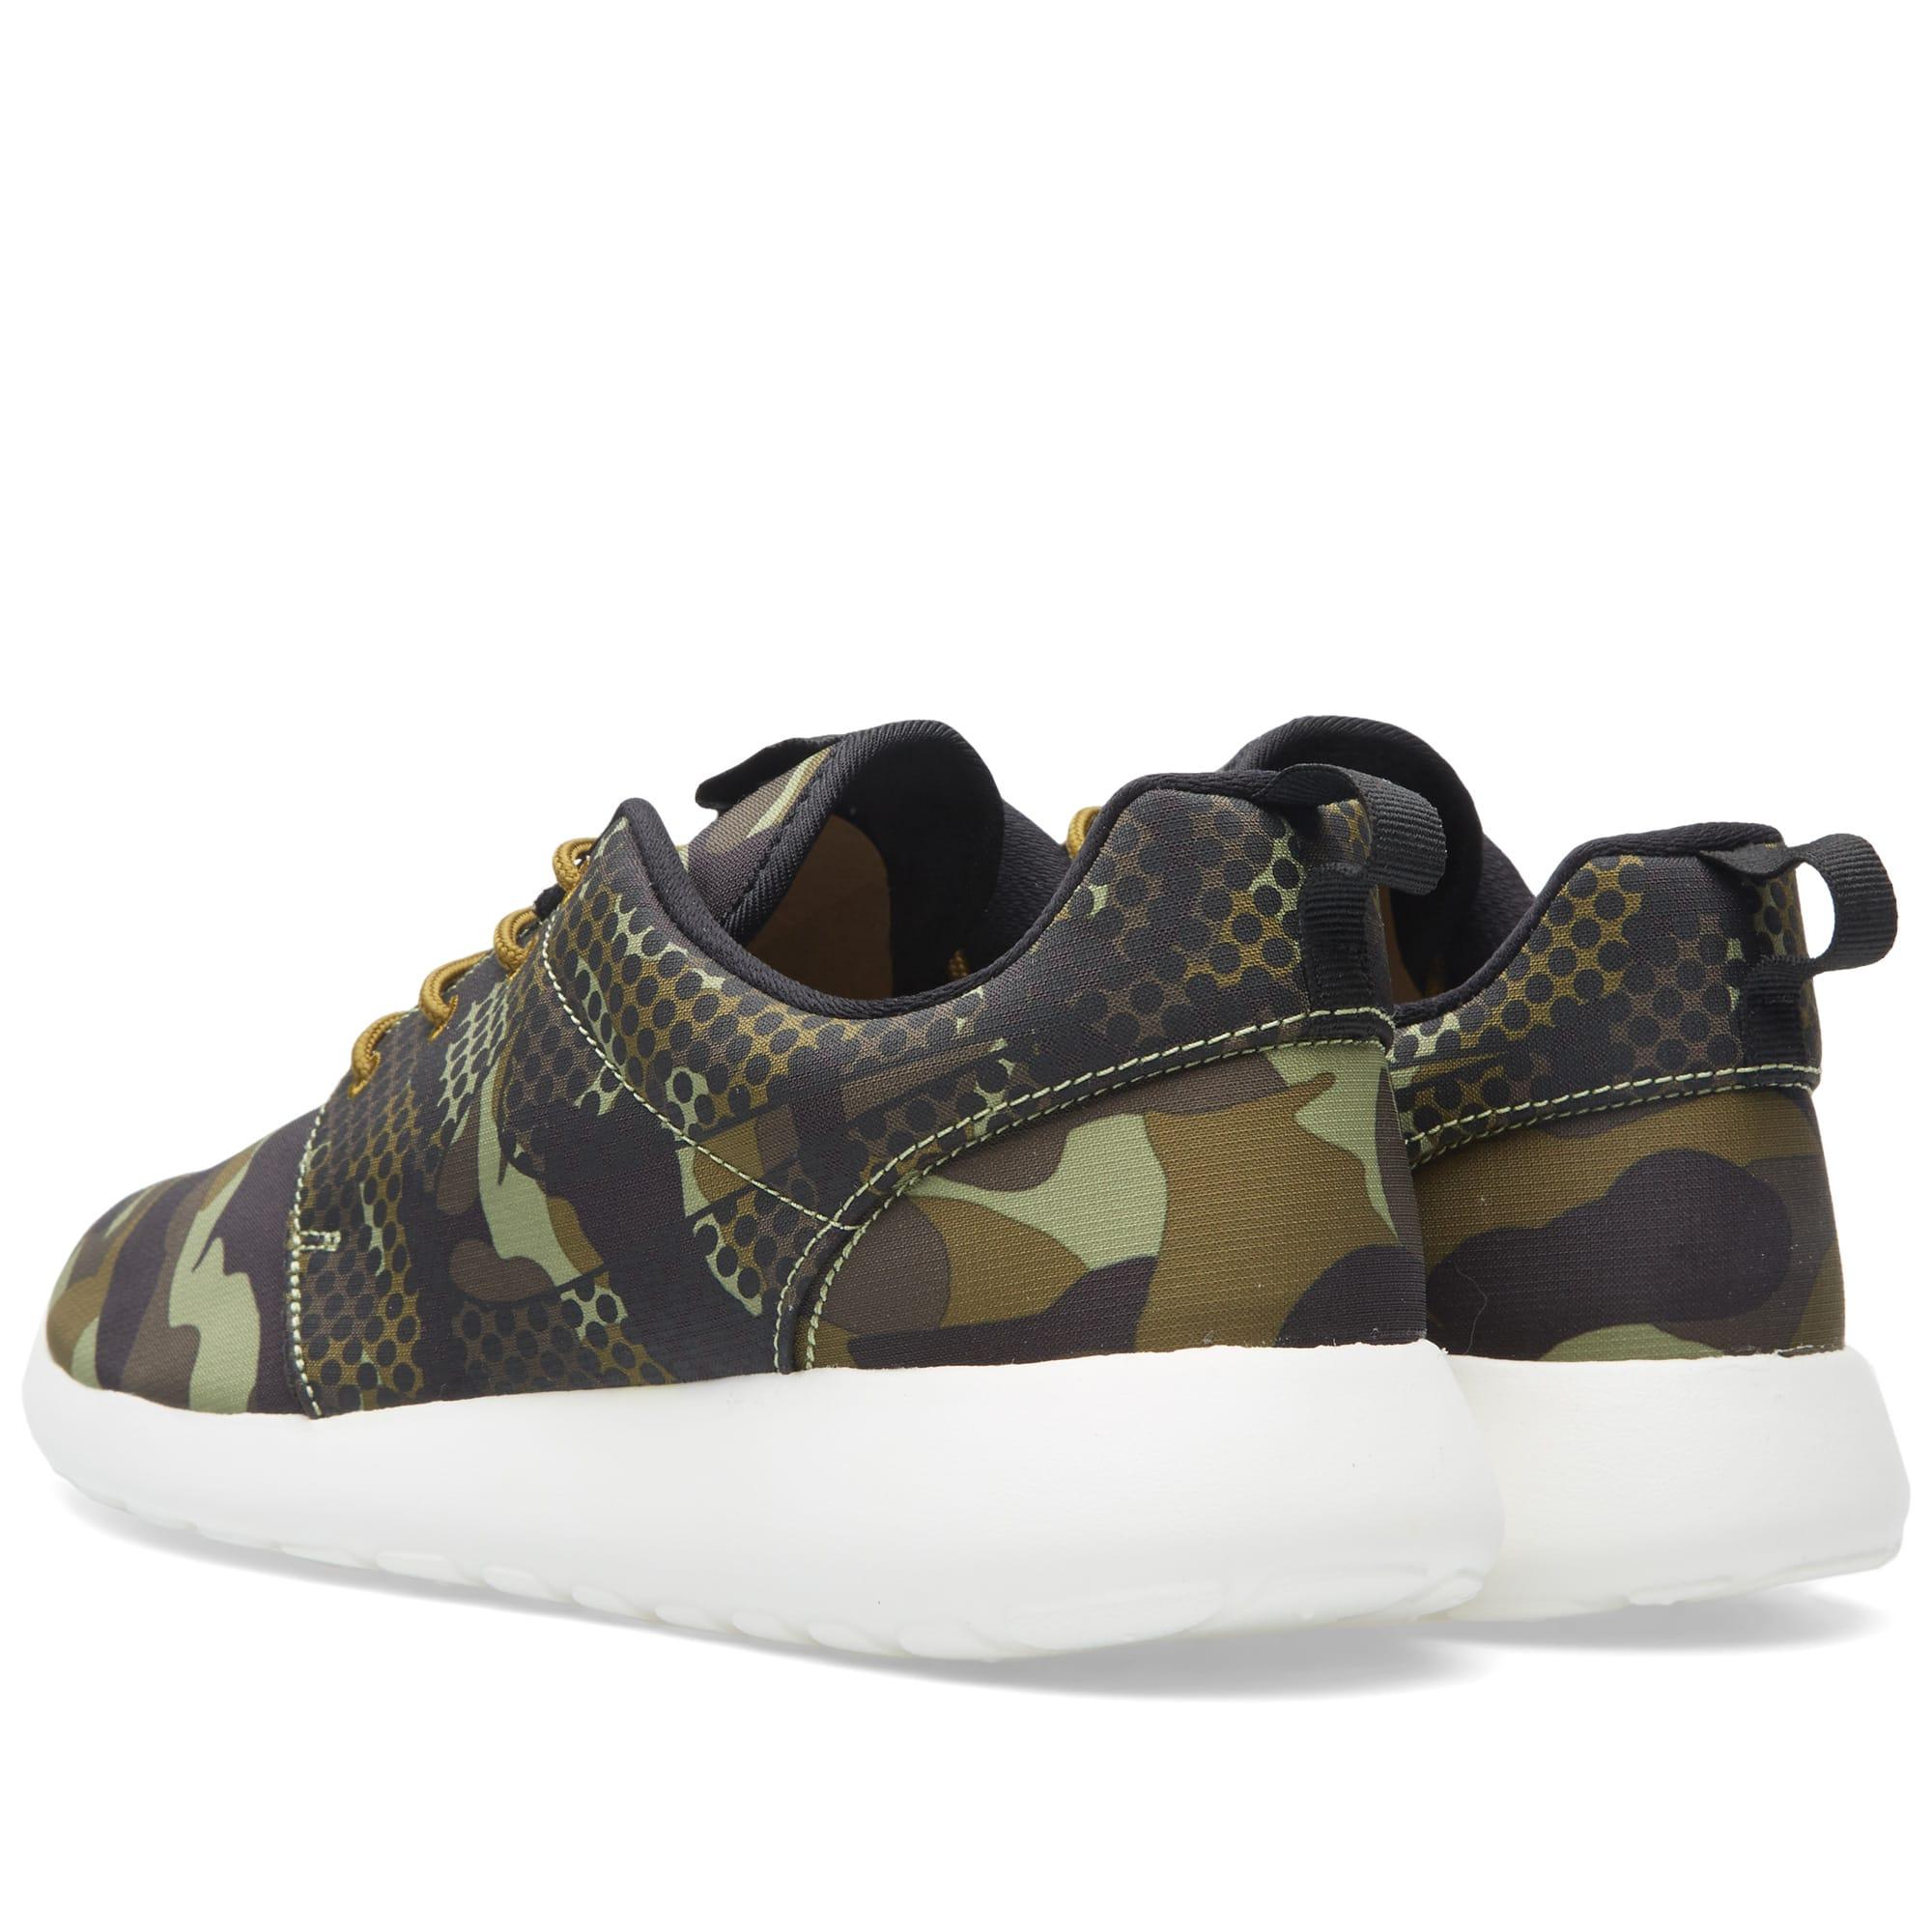 the latest 4a1ee 434a7 italy nike air max 97 og femme b7266 653e7  purchase nike crocodile  sneakers e032f a4654